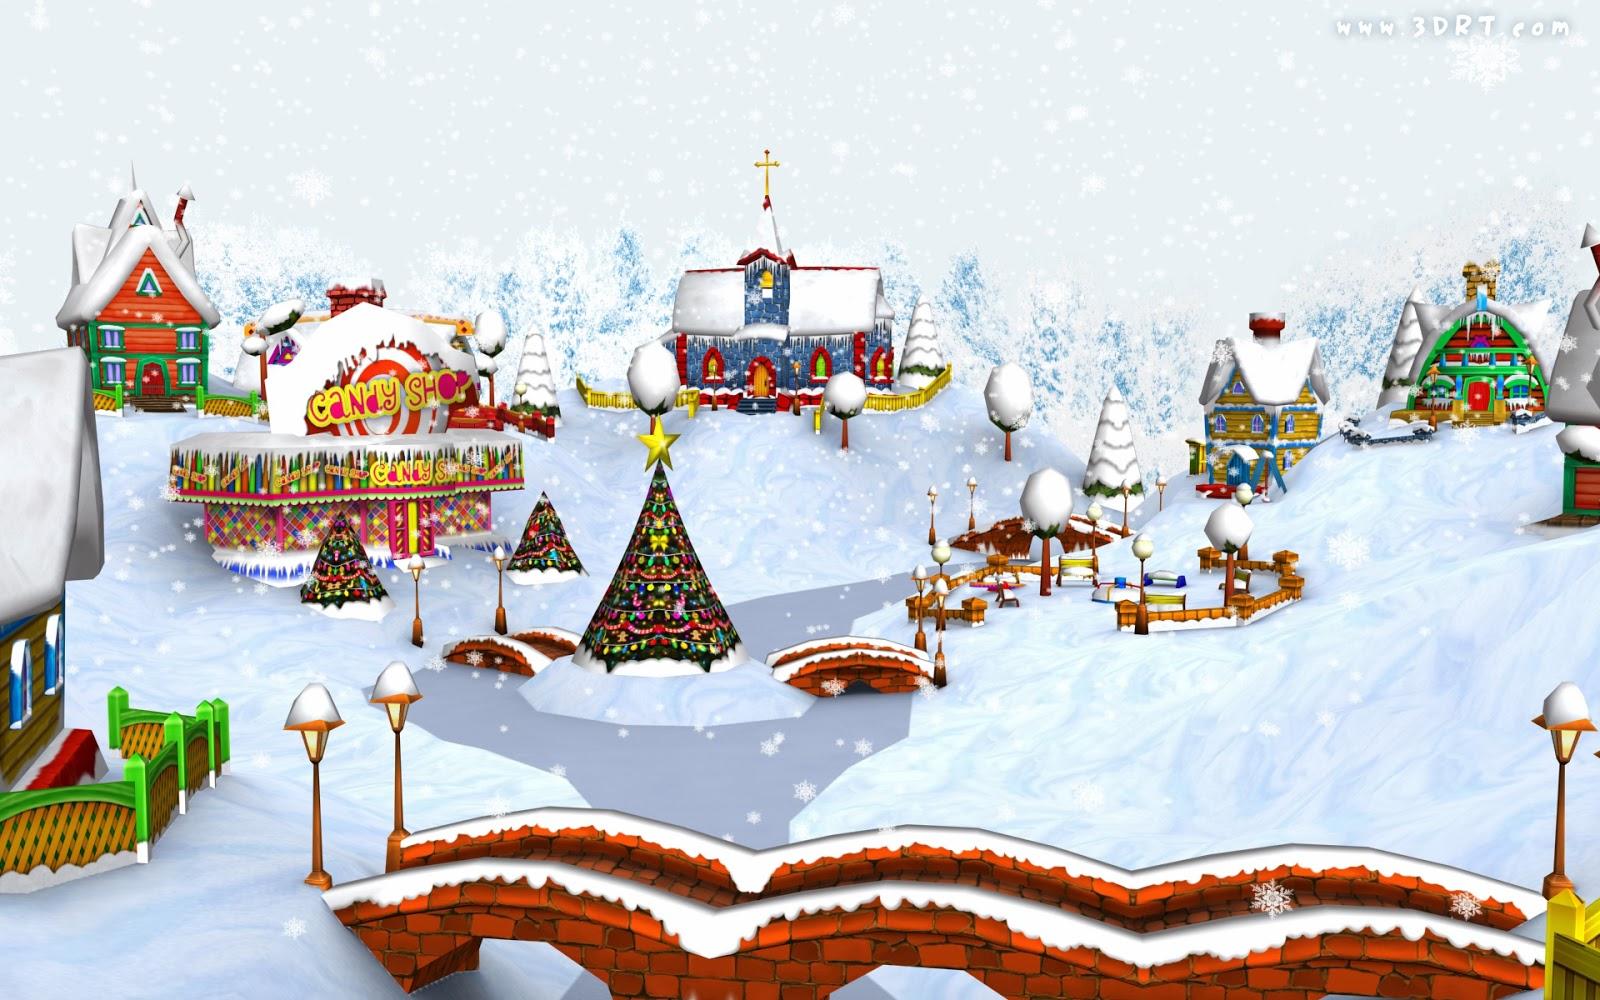 Snowy christmas village hd wallpapers blog - Christmas village wallpaper widescreen ...